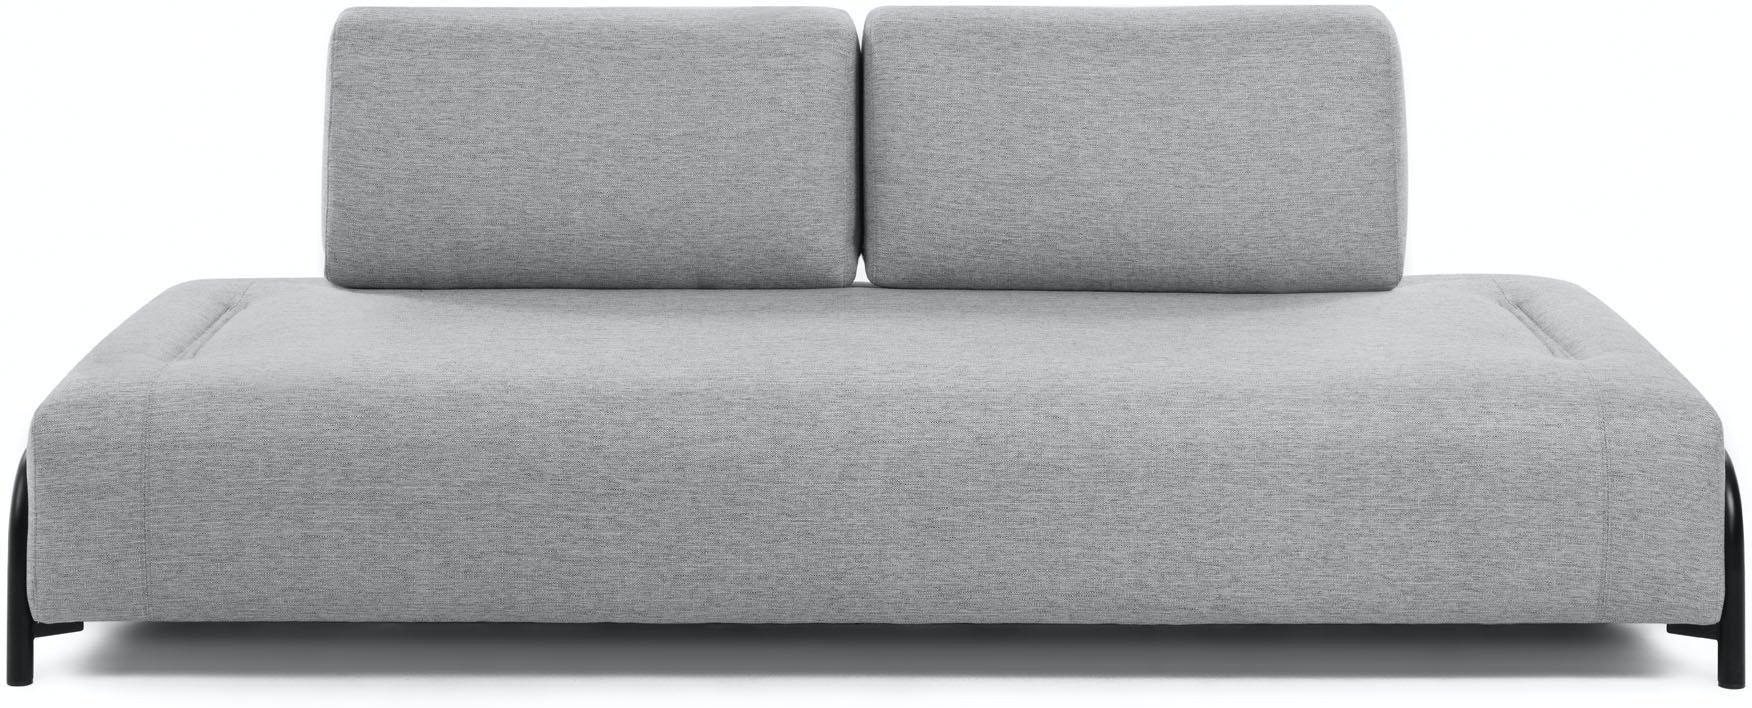 Compo, 3-personers sofa by LaForma (Uden armlæn, Grå)